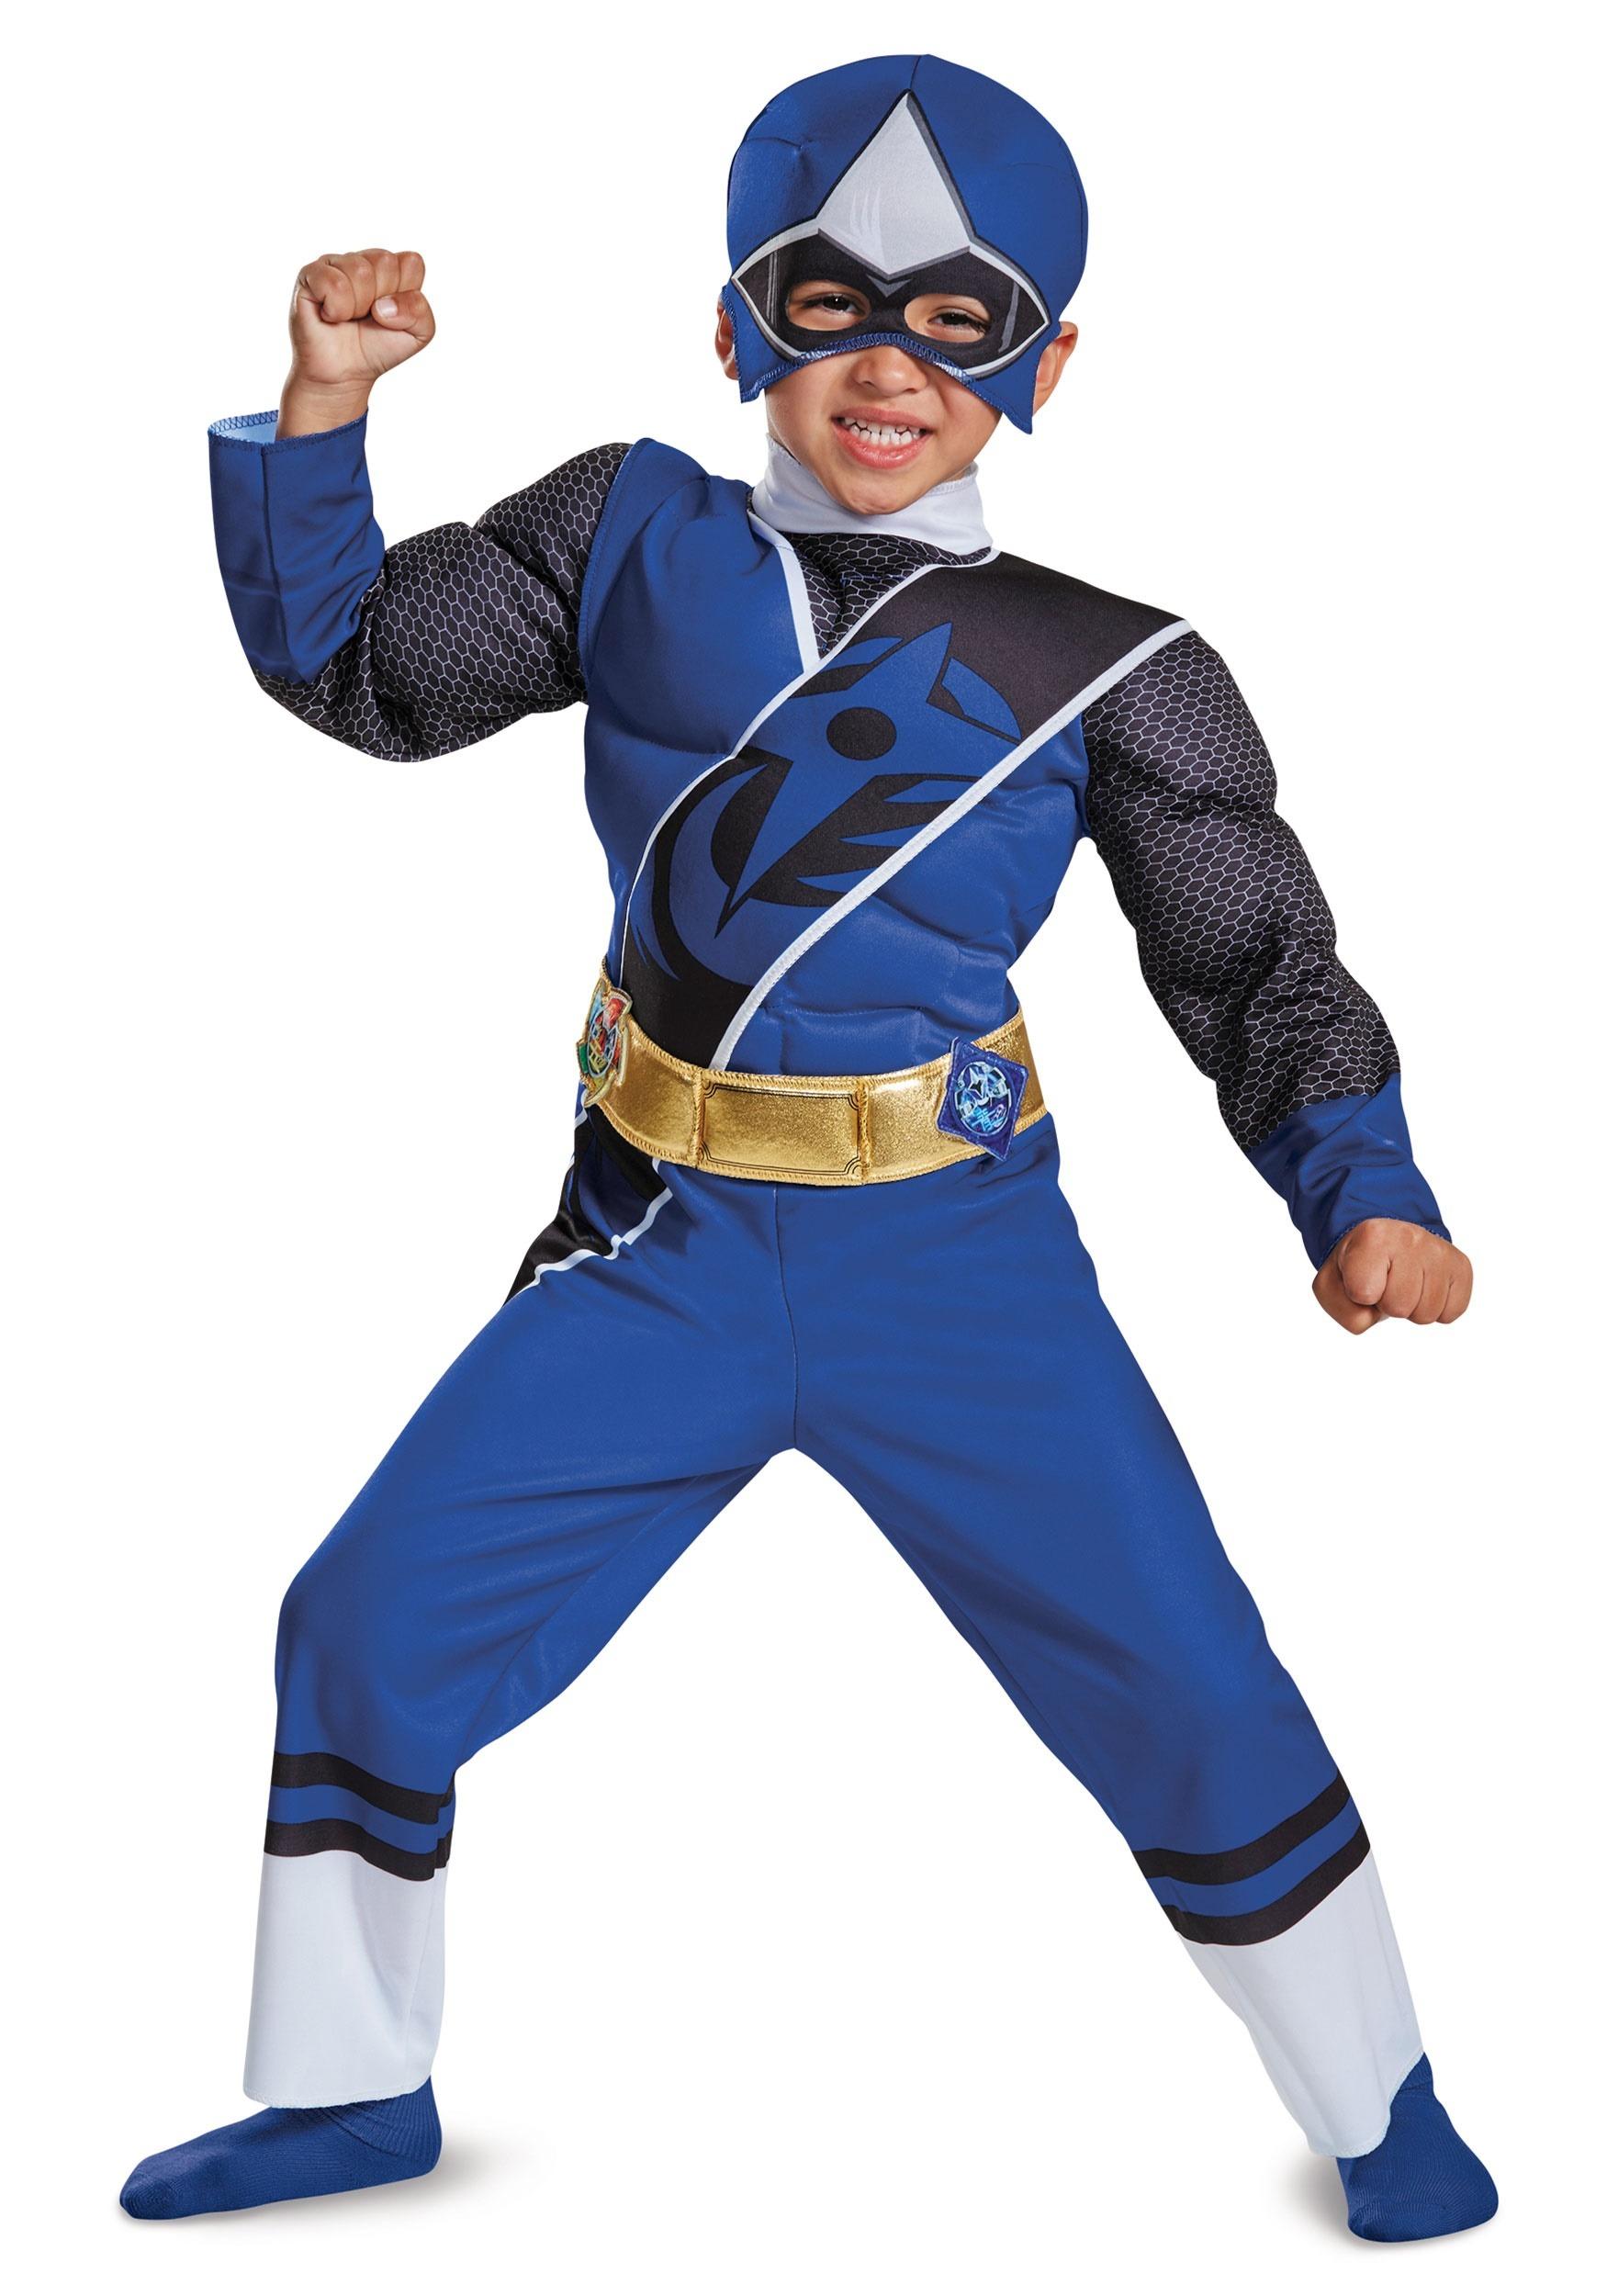 Power Rangers Ninja Steel Blue Ranger Muscle Costume For Toddlers